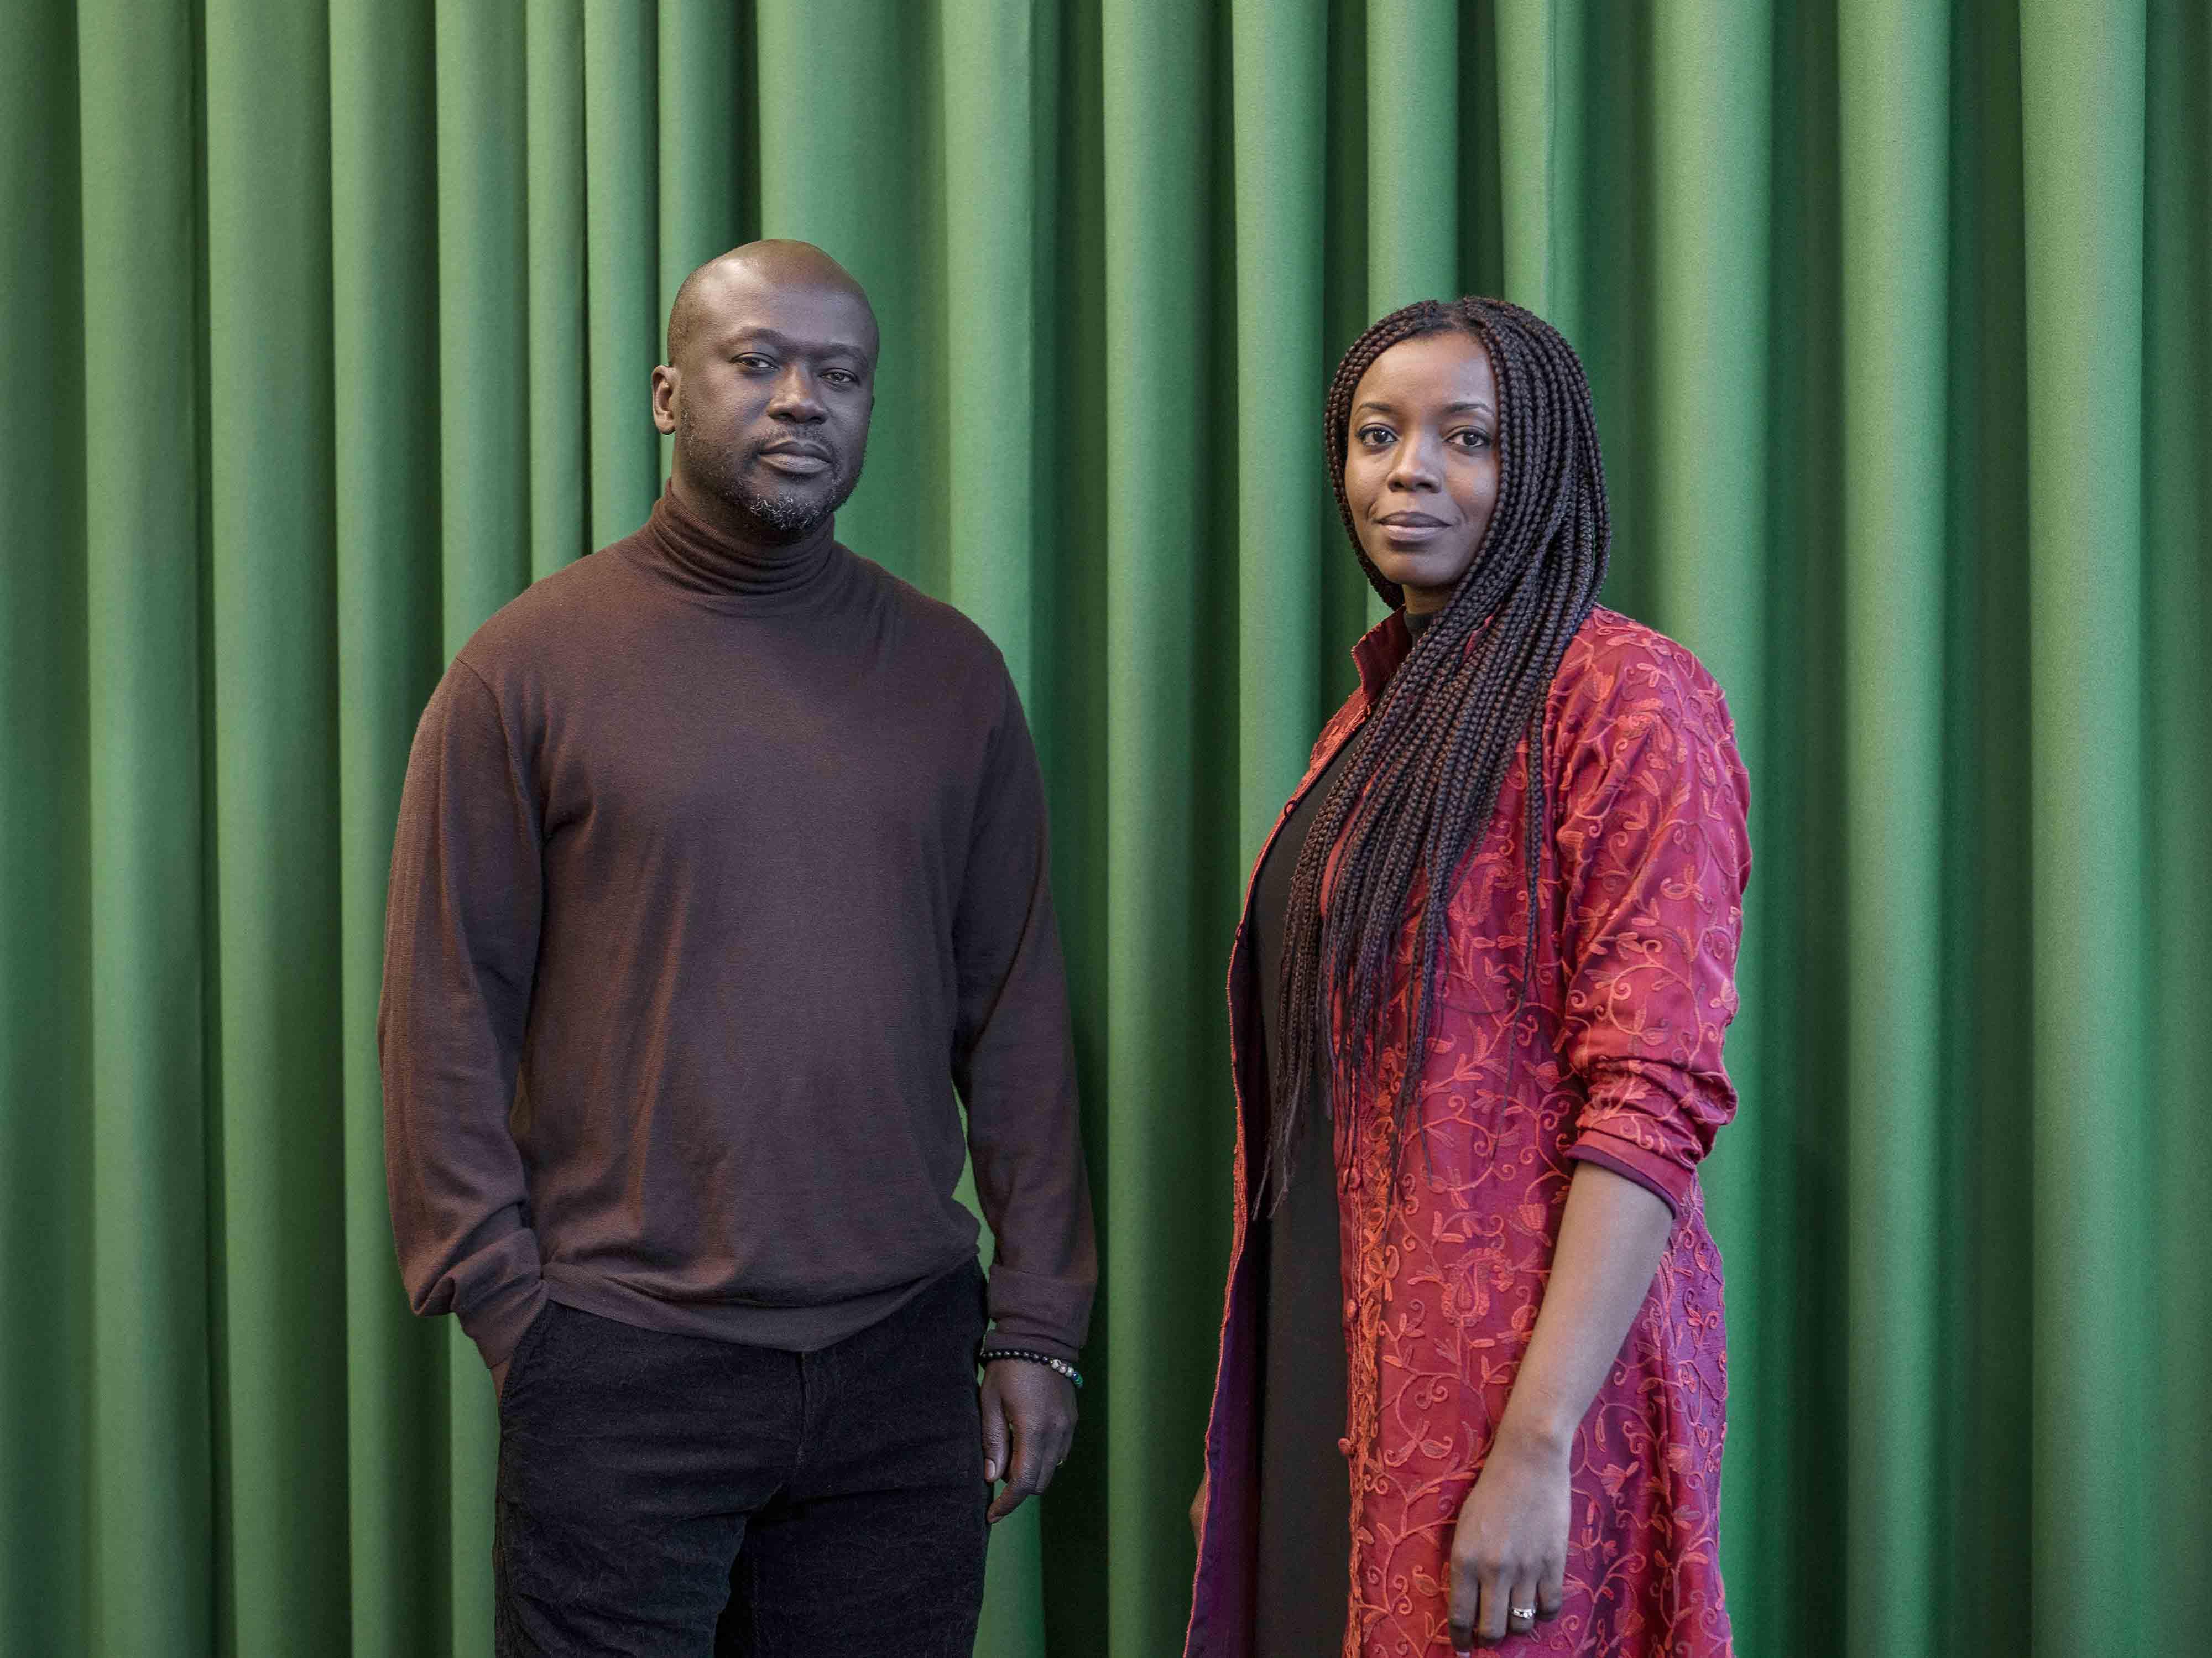 David Adjaye, mentor en architecture et sa protégée Mariam Kamara. ©Rolex/Tina Ruisinger.